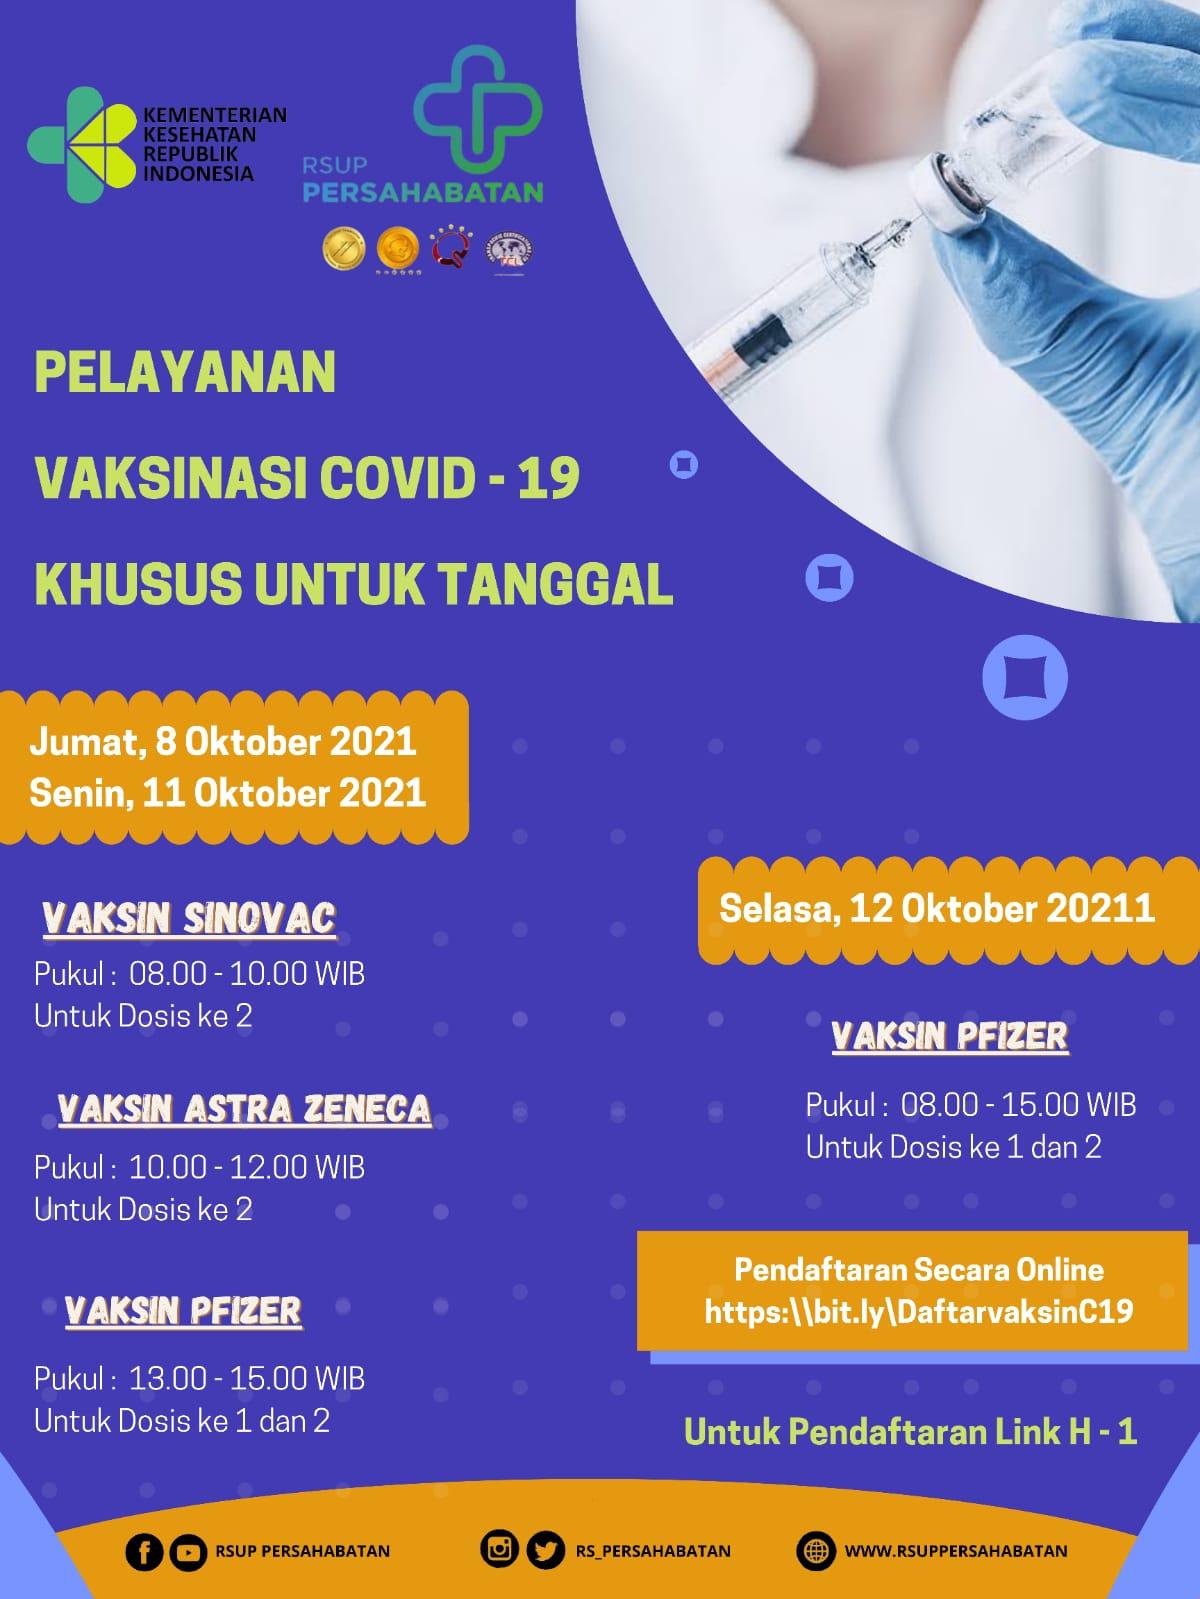 Pelayanan Vaksinasi Covid-19 Vaksin Sinovac, Astra Zeneca dan Pfizer